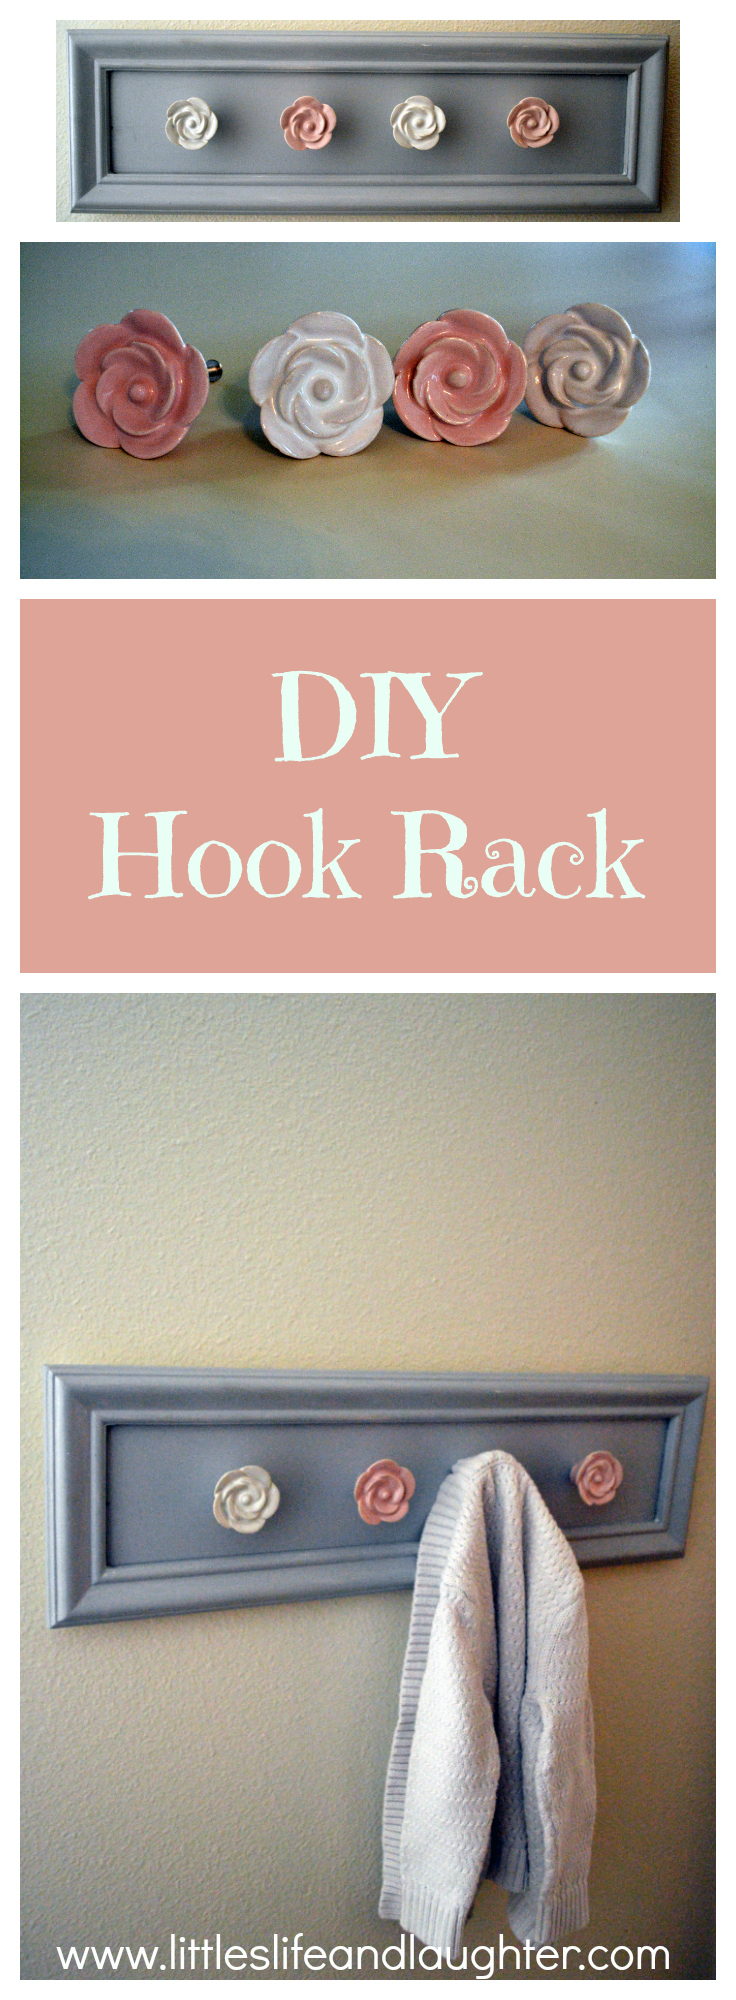 DIY Hook Rack - Littles, Life, & Laughter